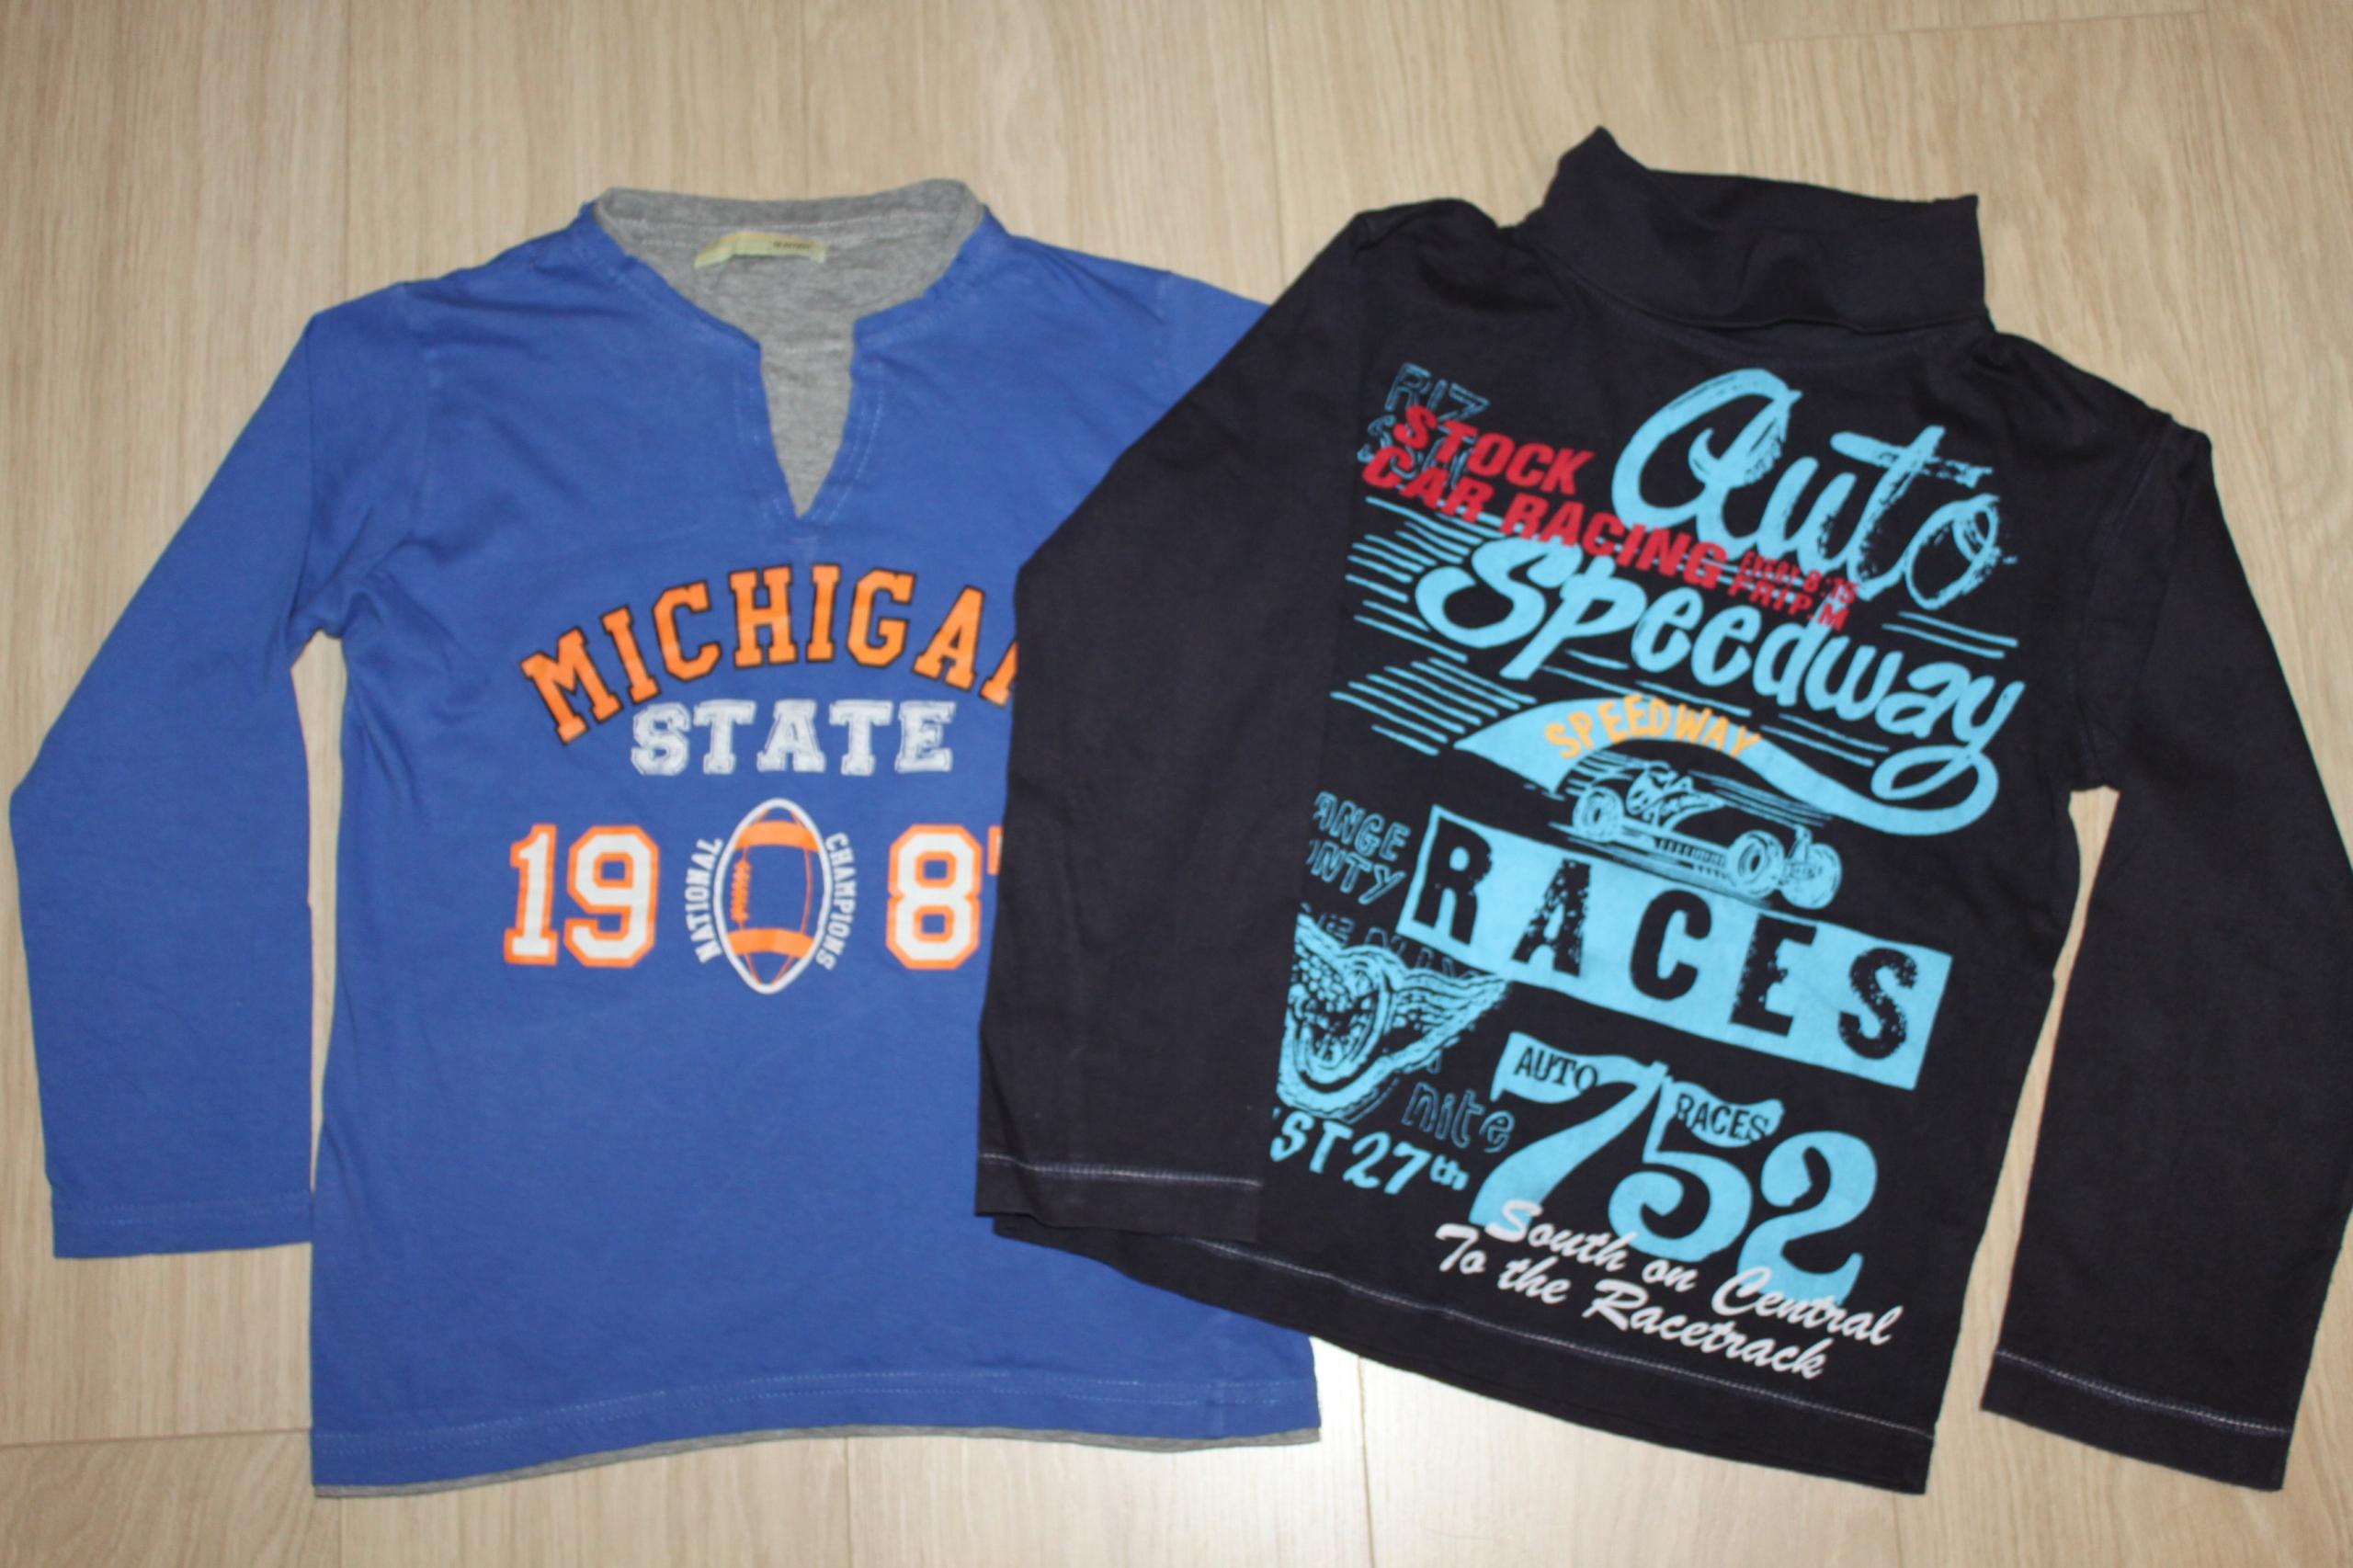 2 x bluzki długi rękaw CoolClub 122 /128 +3.gratis